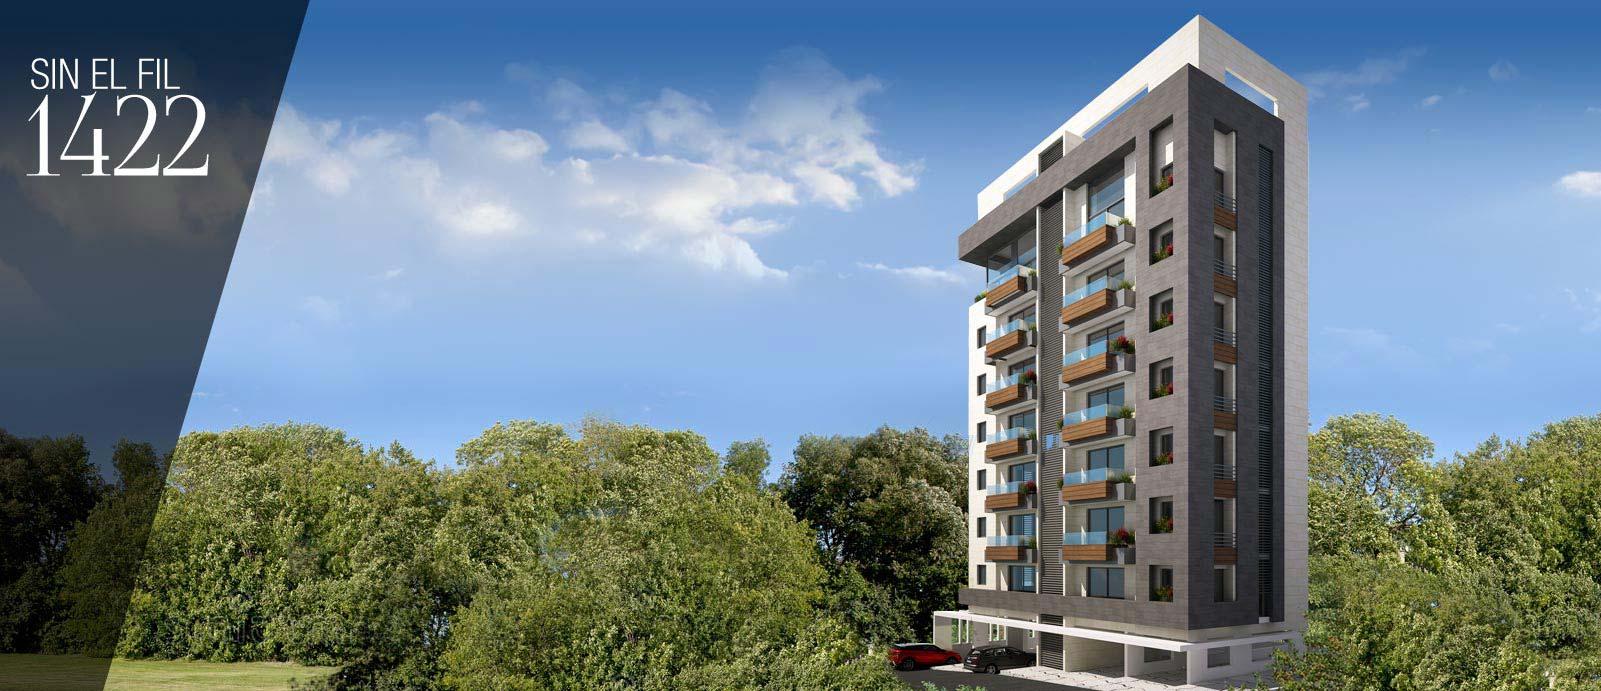 Apartments for sale in Sin El Fil 1422